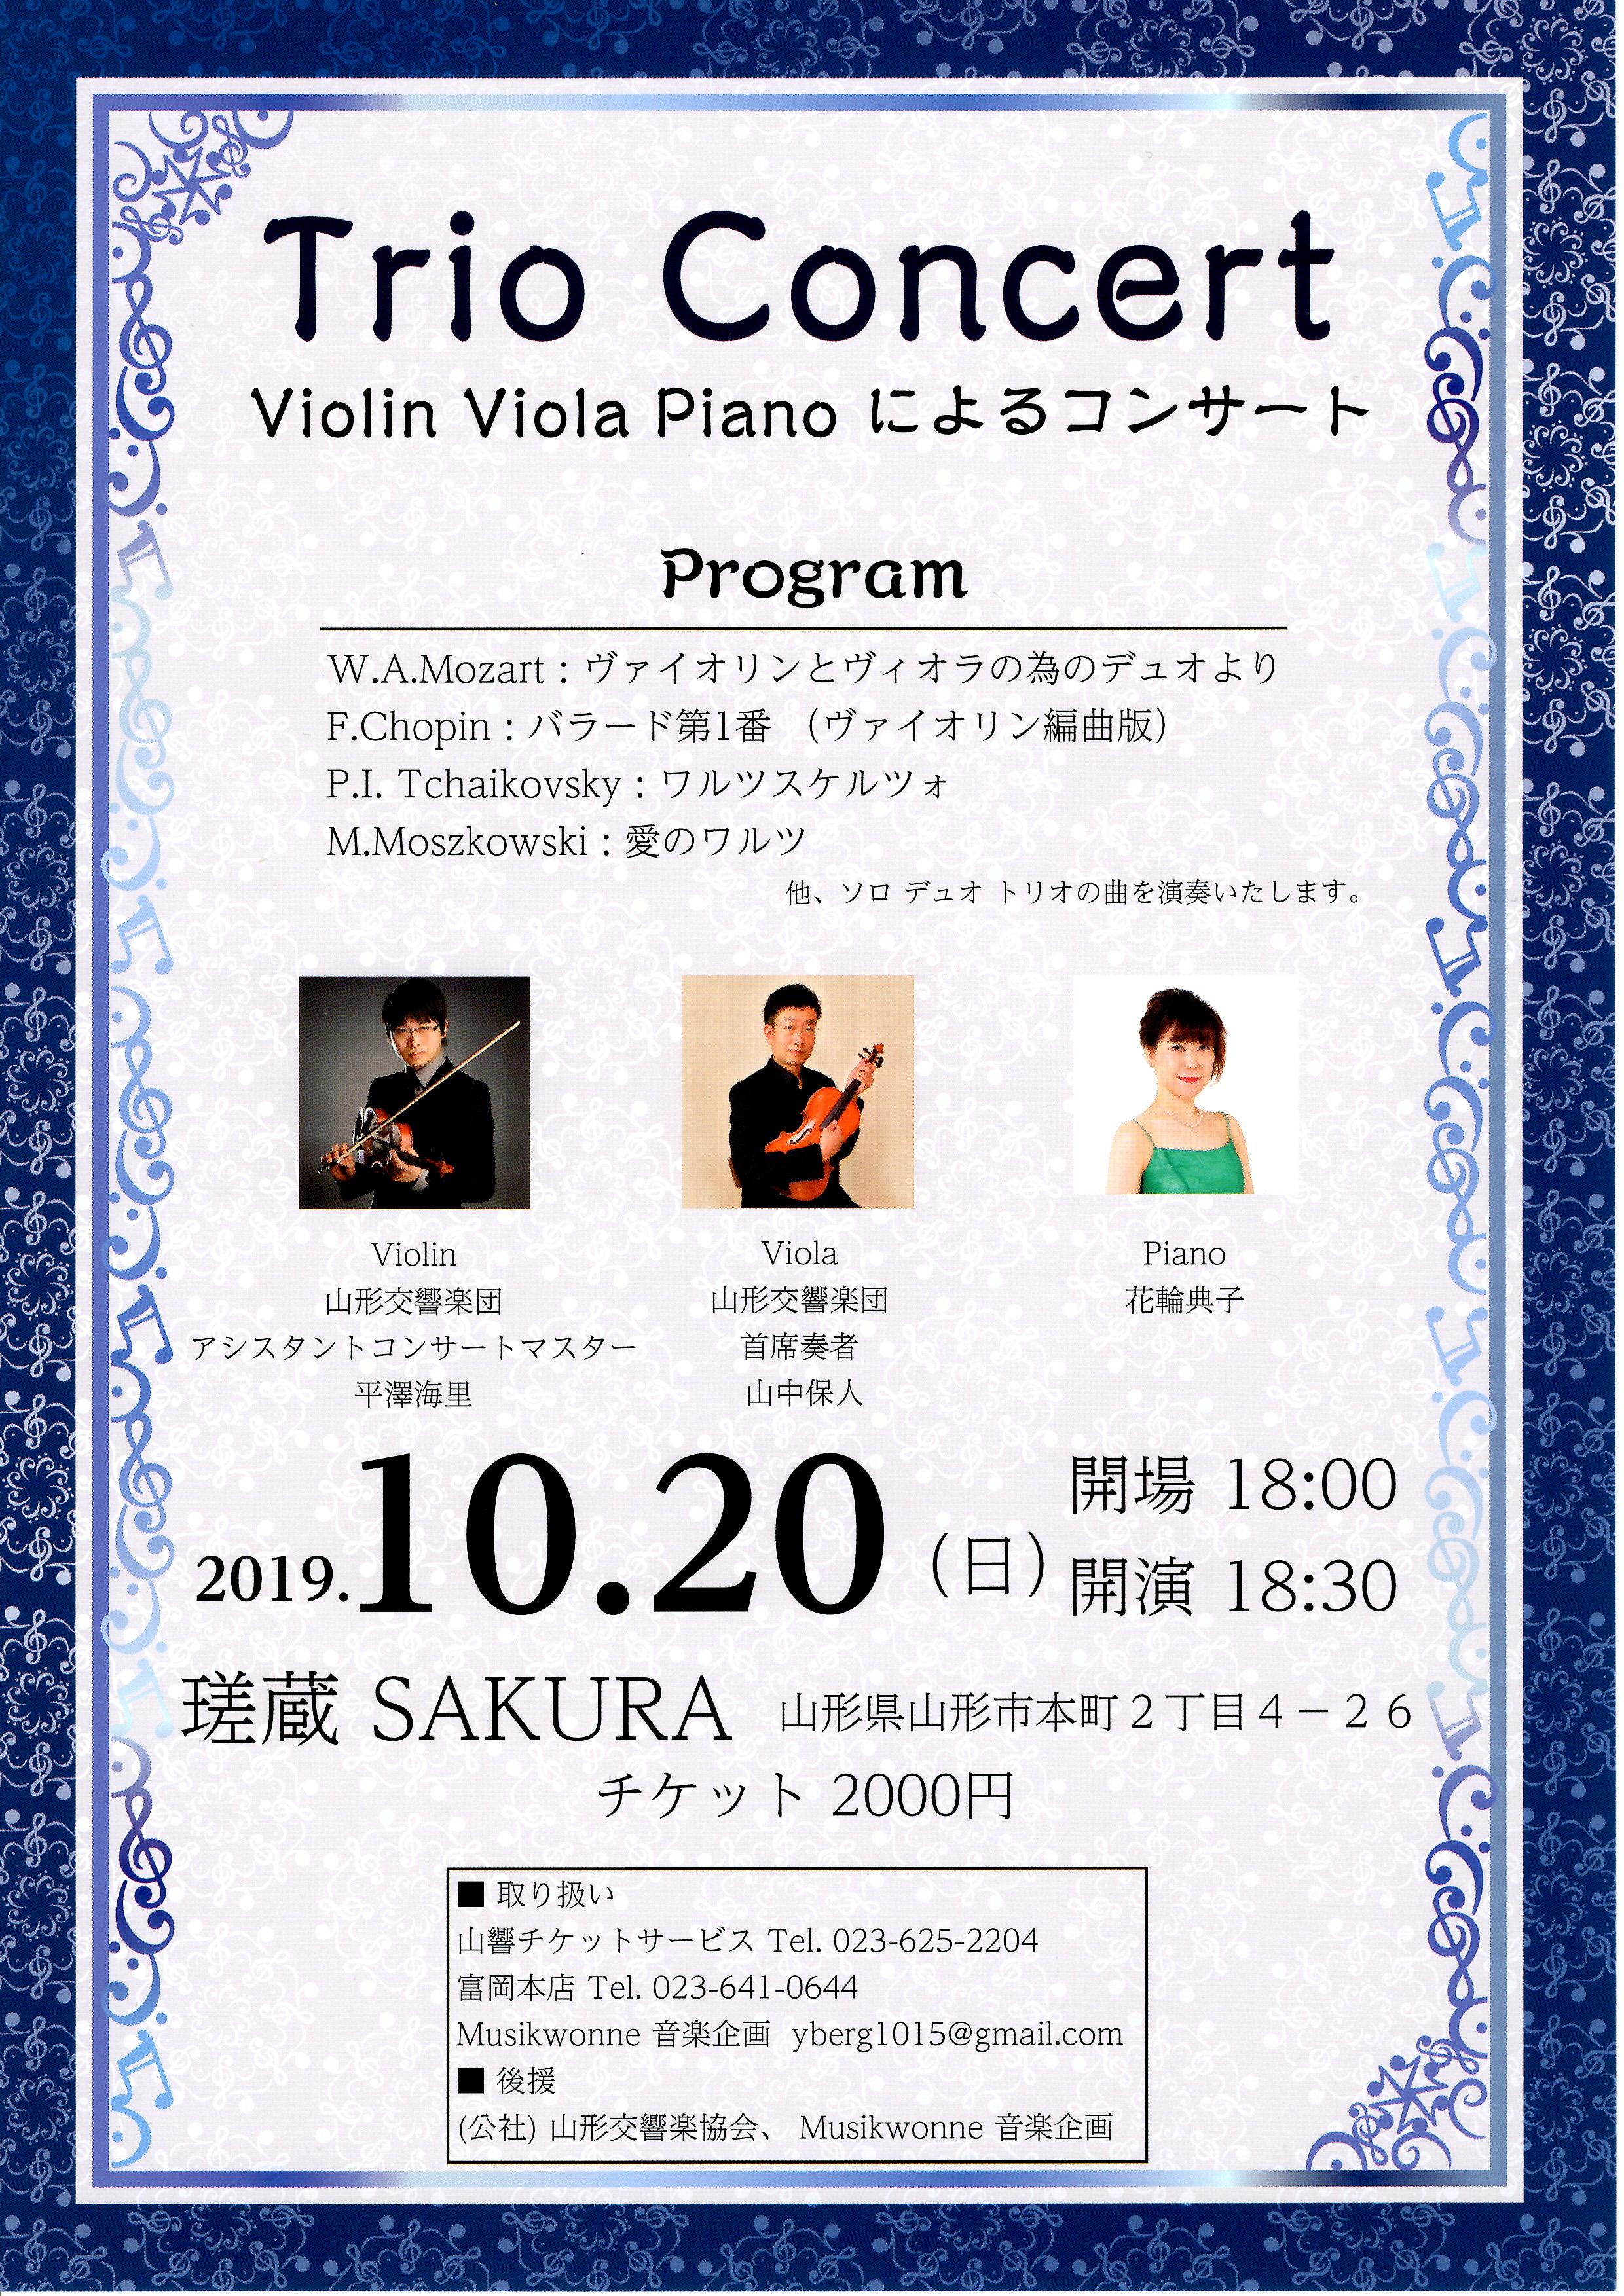 Trio Concert  Violin Viola Pianoによるコンサート